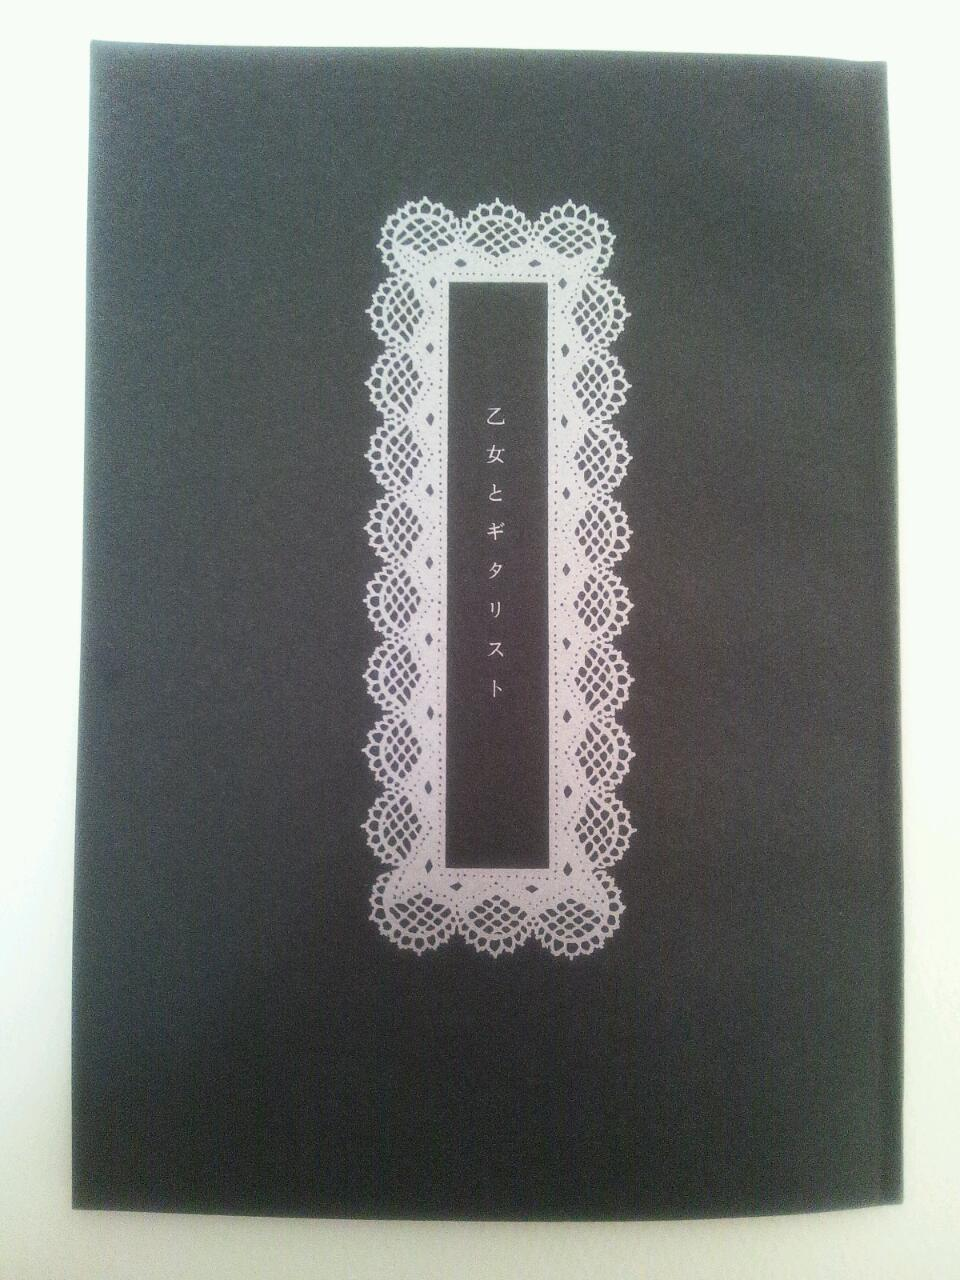 【SHIBUYA  PUBLISHING  BOOKSELLERS】リトルプレスフェアに参加します